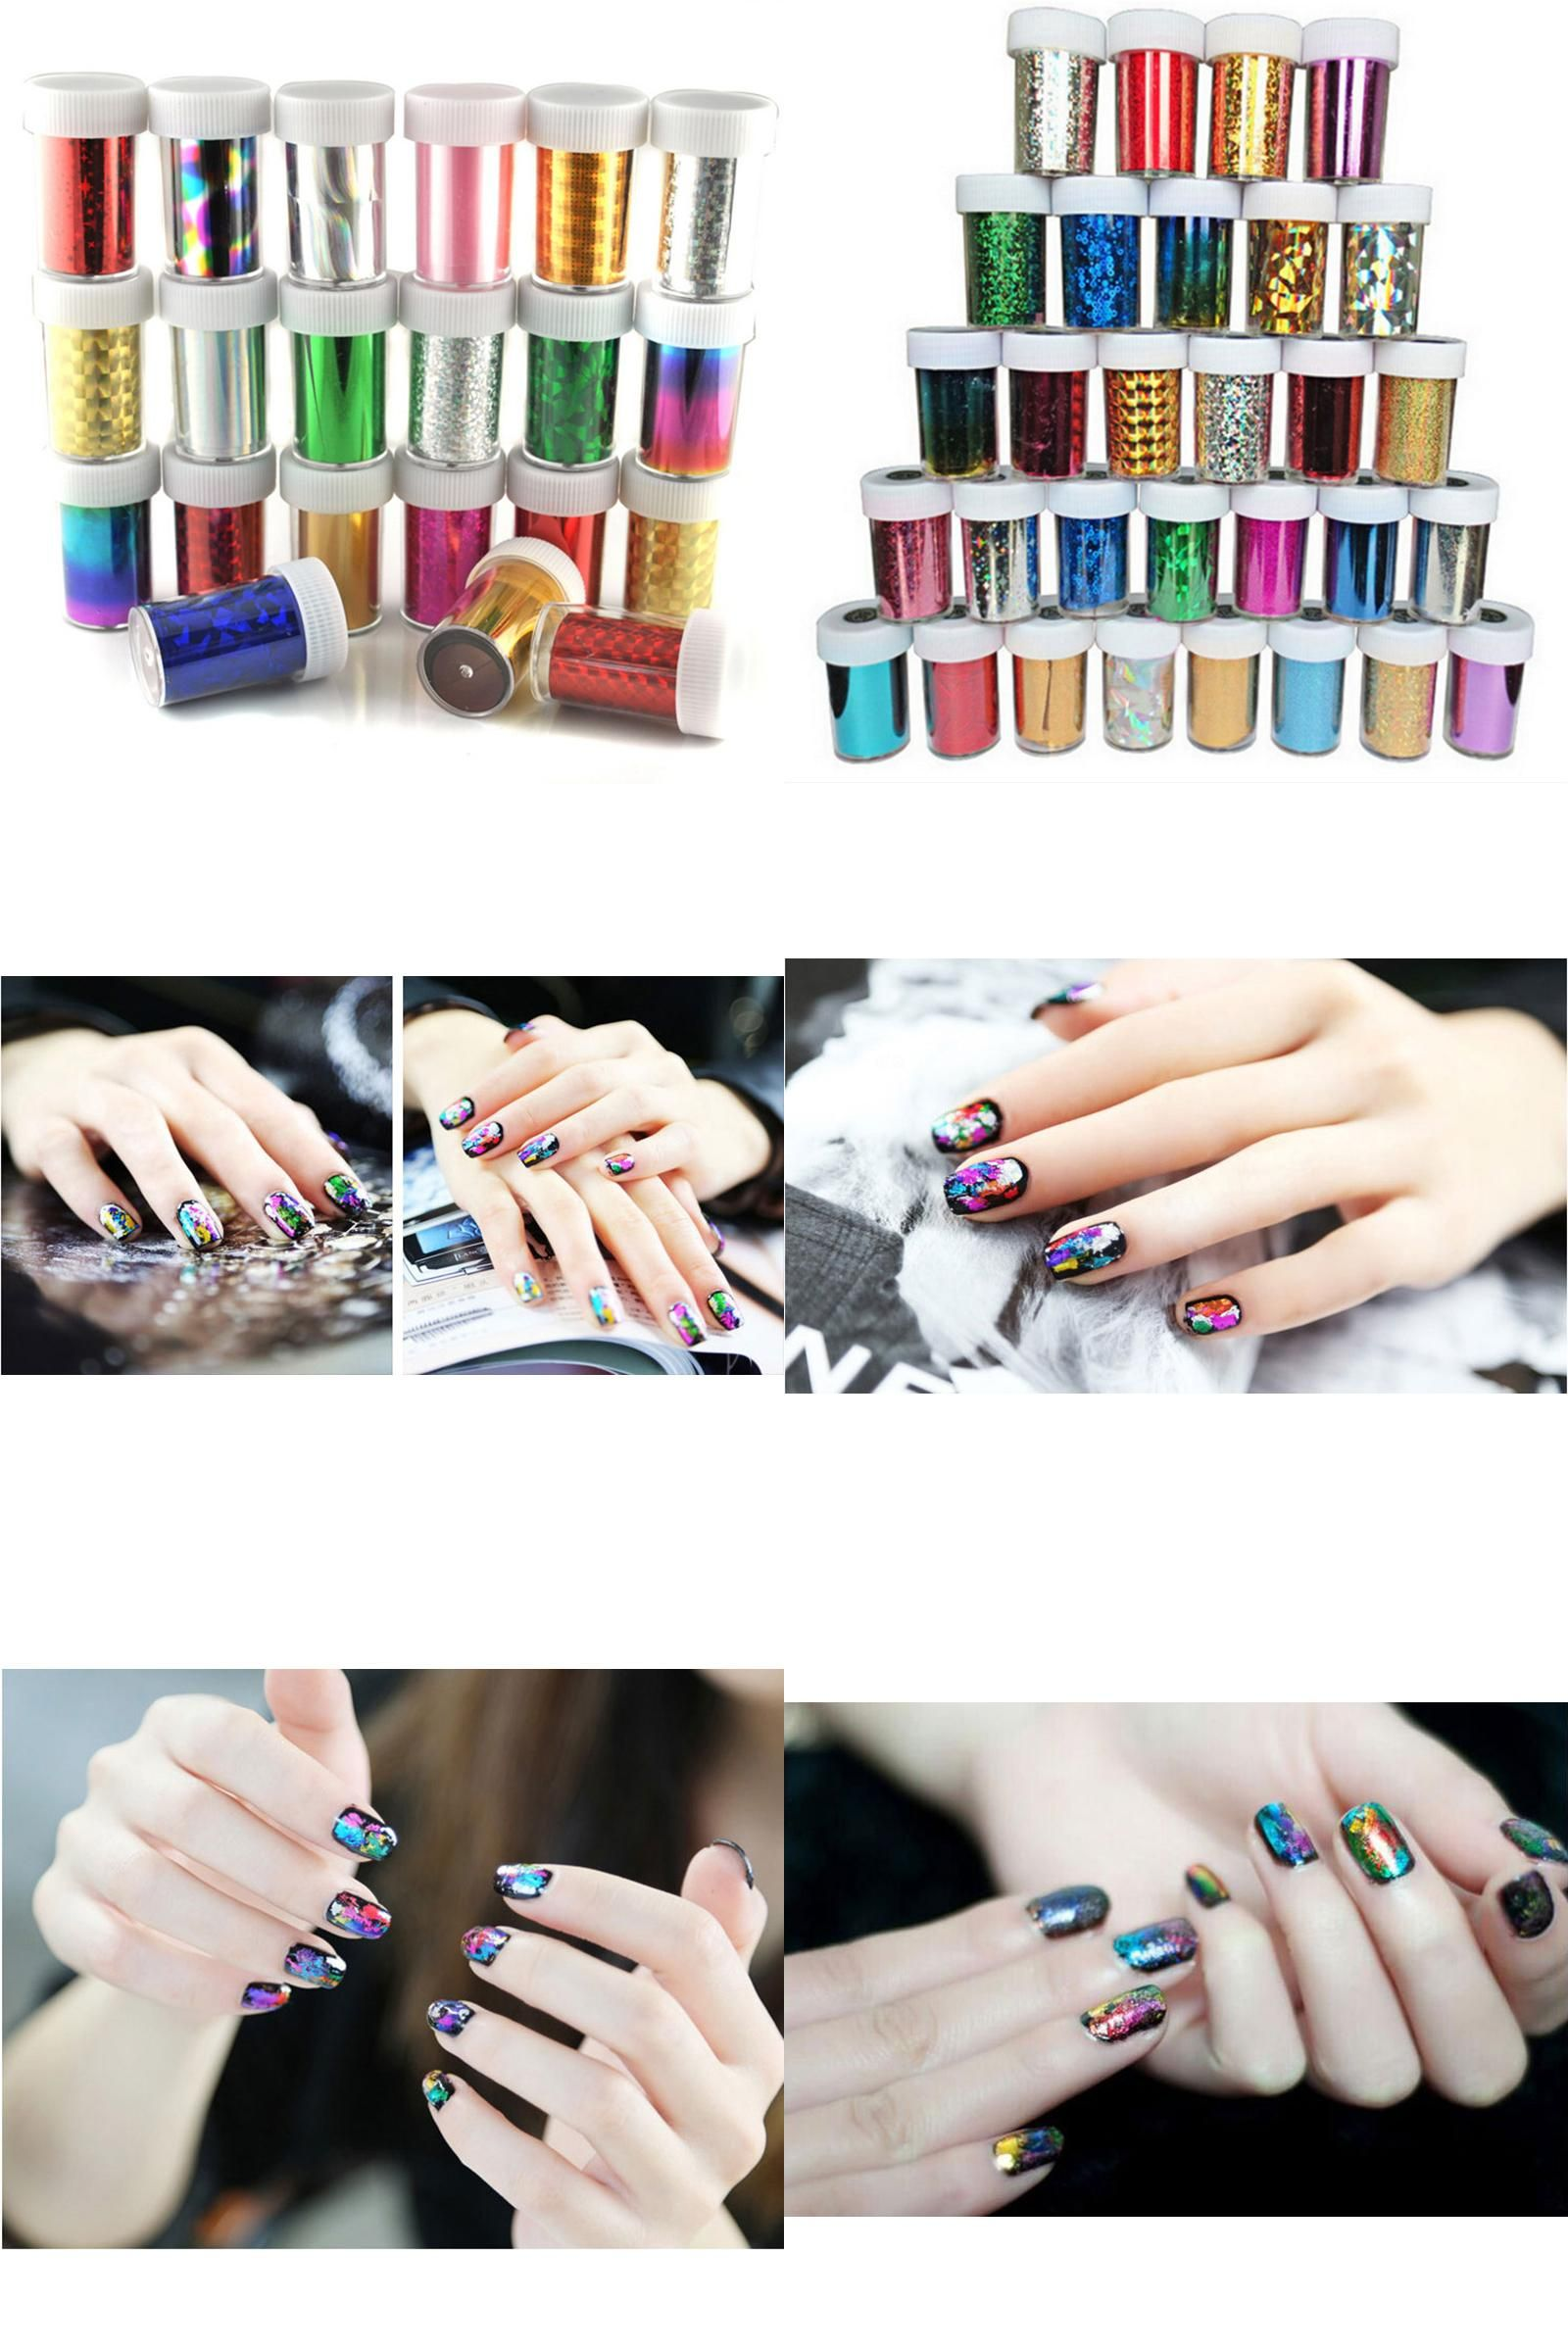 Visit to Buy] 1 Pc 31 Colors Nail Transfer Foils DIY Foil Polish ...